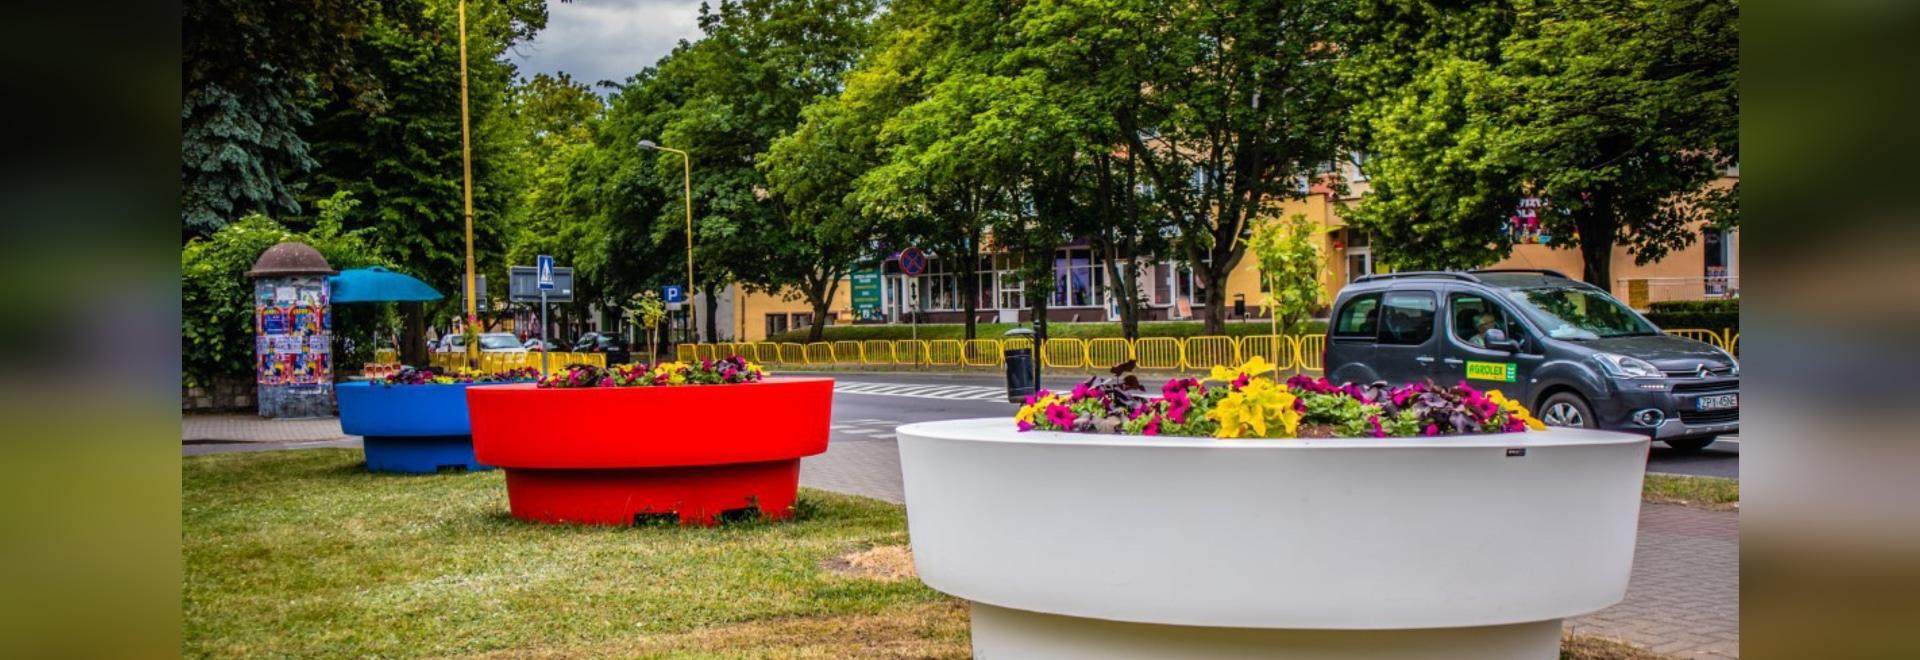 Grands pots de fleurs Gianto / avec un siège / TerraFormdeisgn.eu